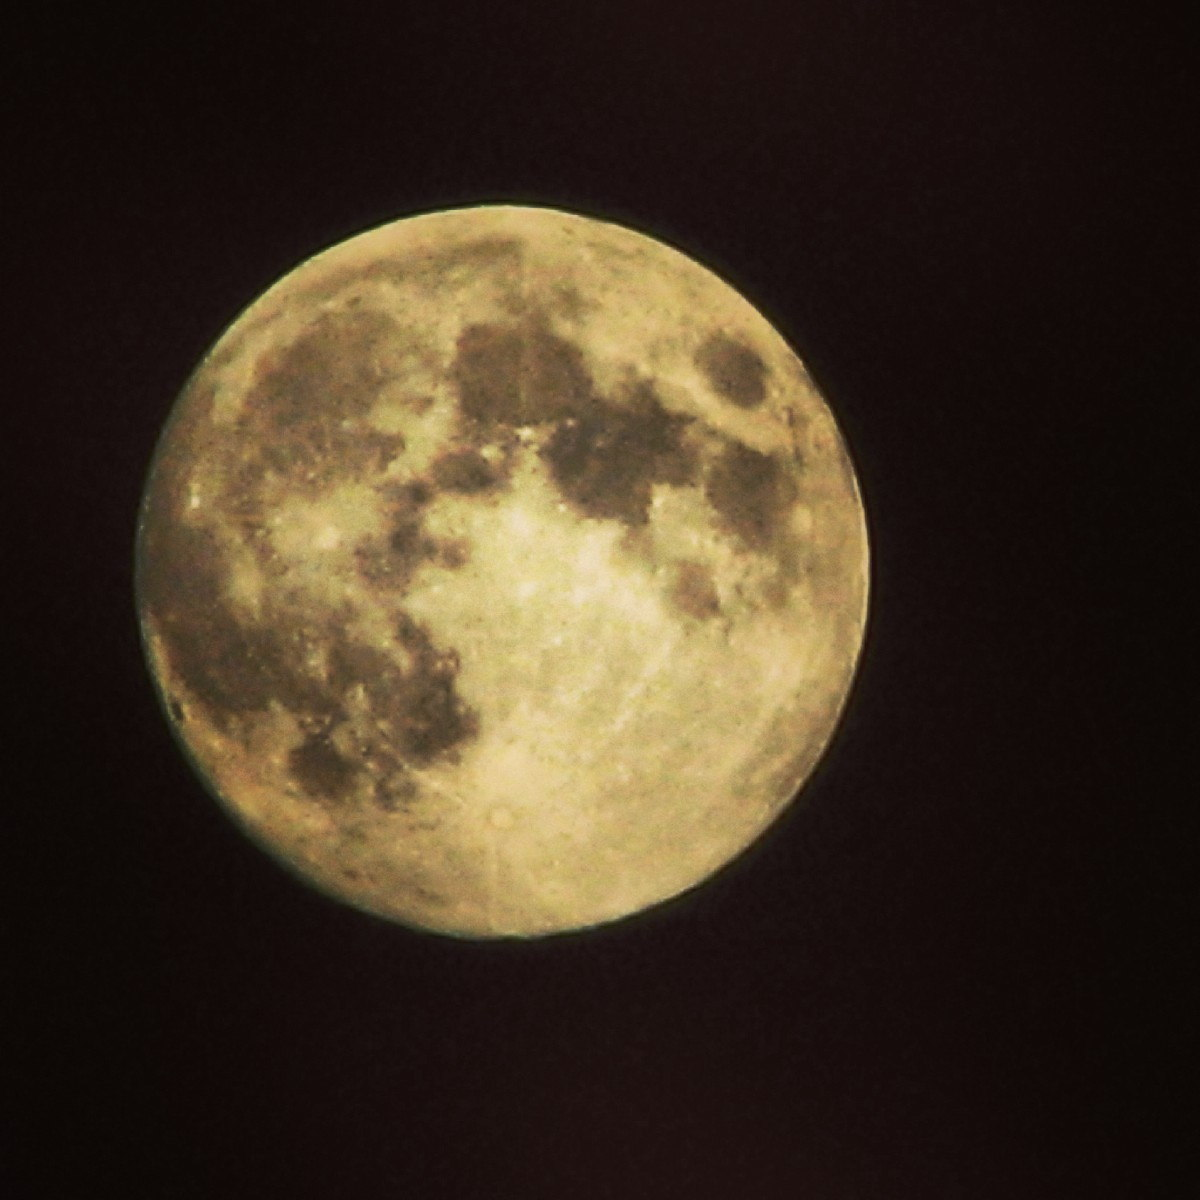 2013 Harvest Moon Over Ontario